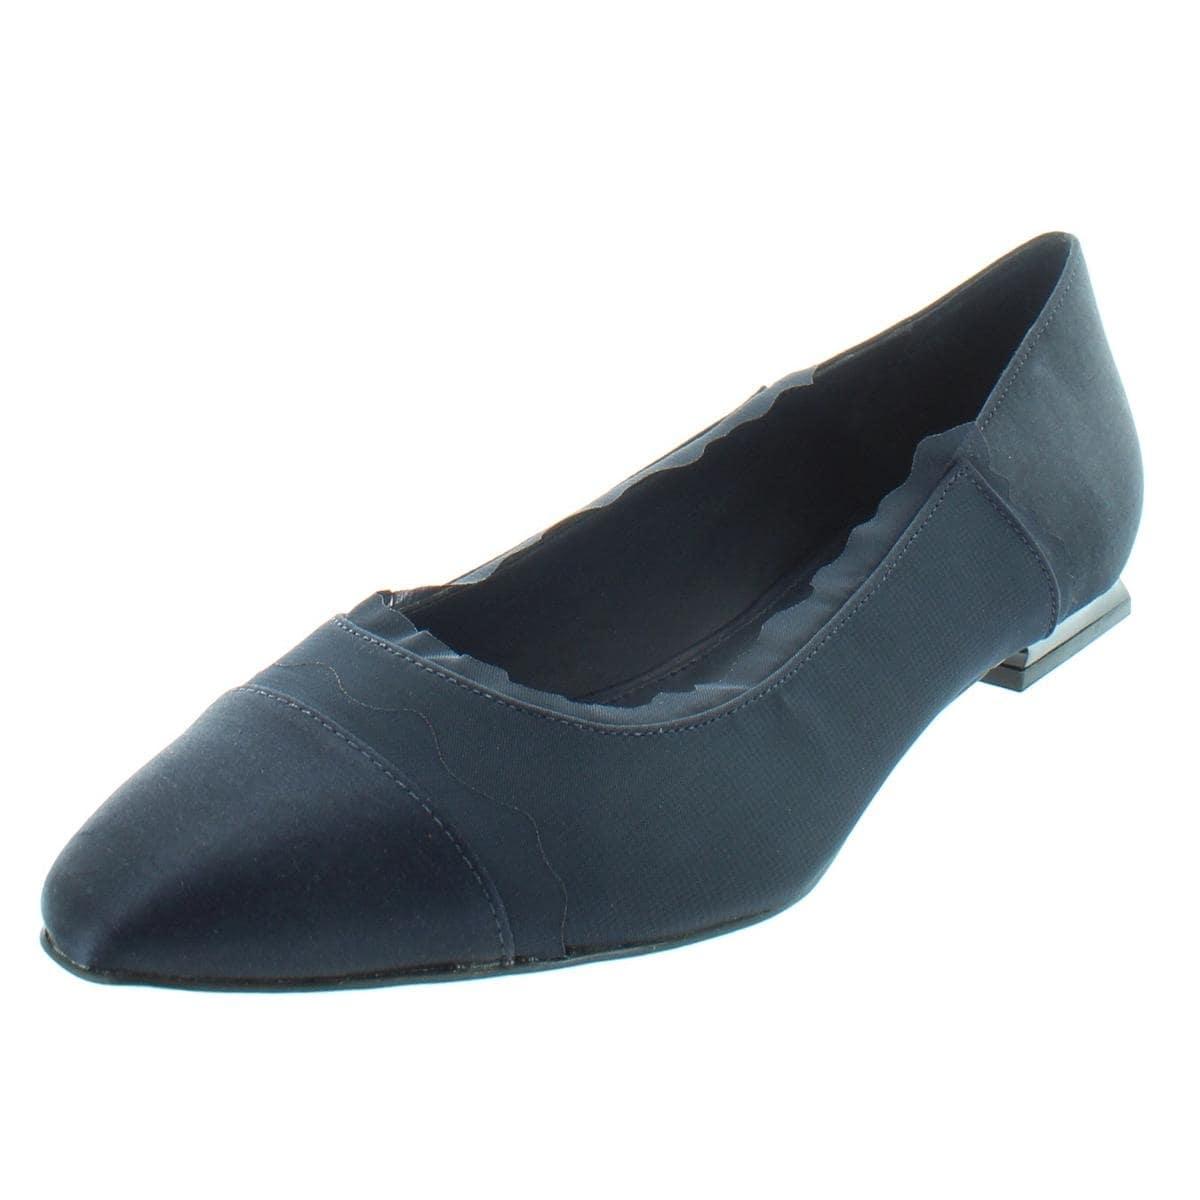 1b2d2ef86546 Shop Calvin Klein Womens Maisha Ballet Flats Satin Scalloped - Free  Shipping Today - Overstock - 21456479